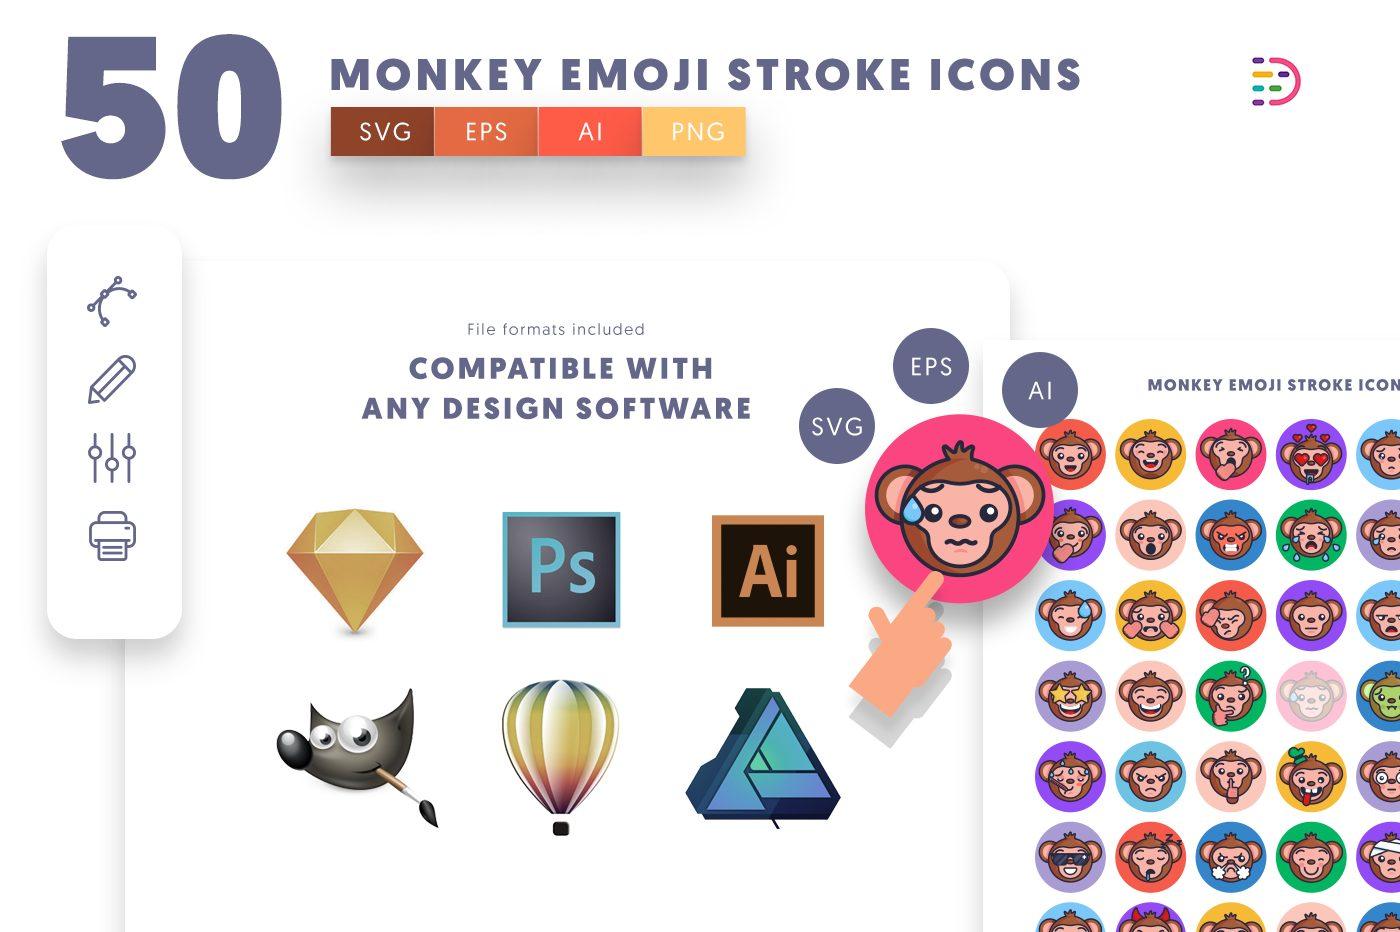 full vector 50 Monkey Emoji Stroke Icons EPS, SVG, PNG